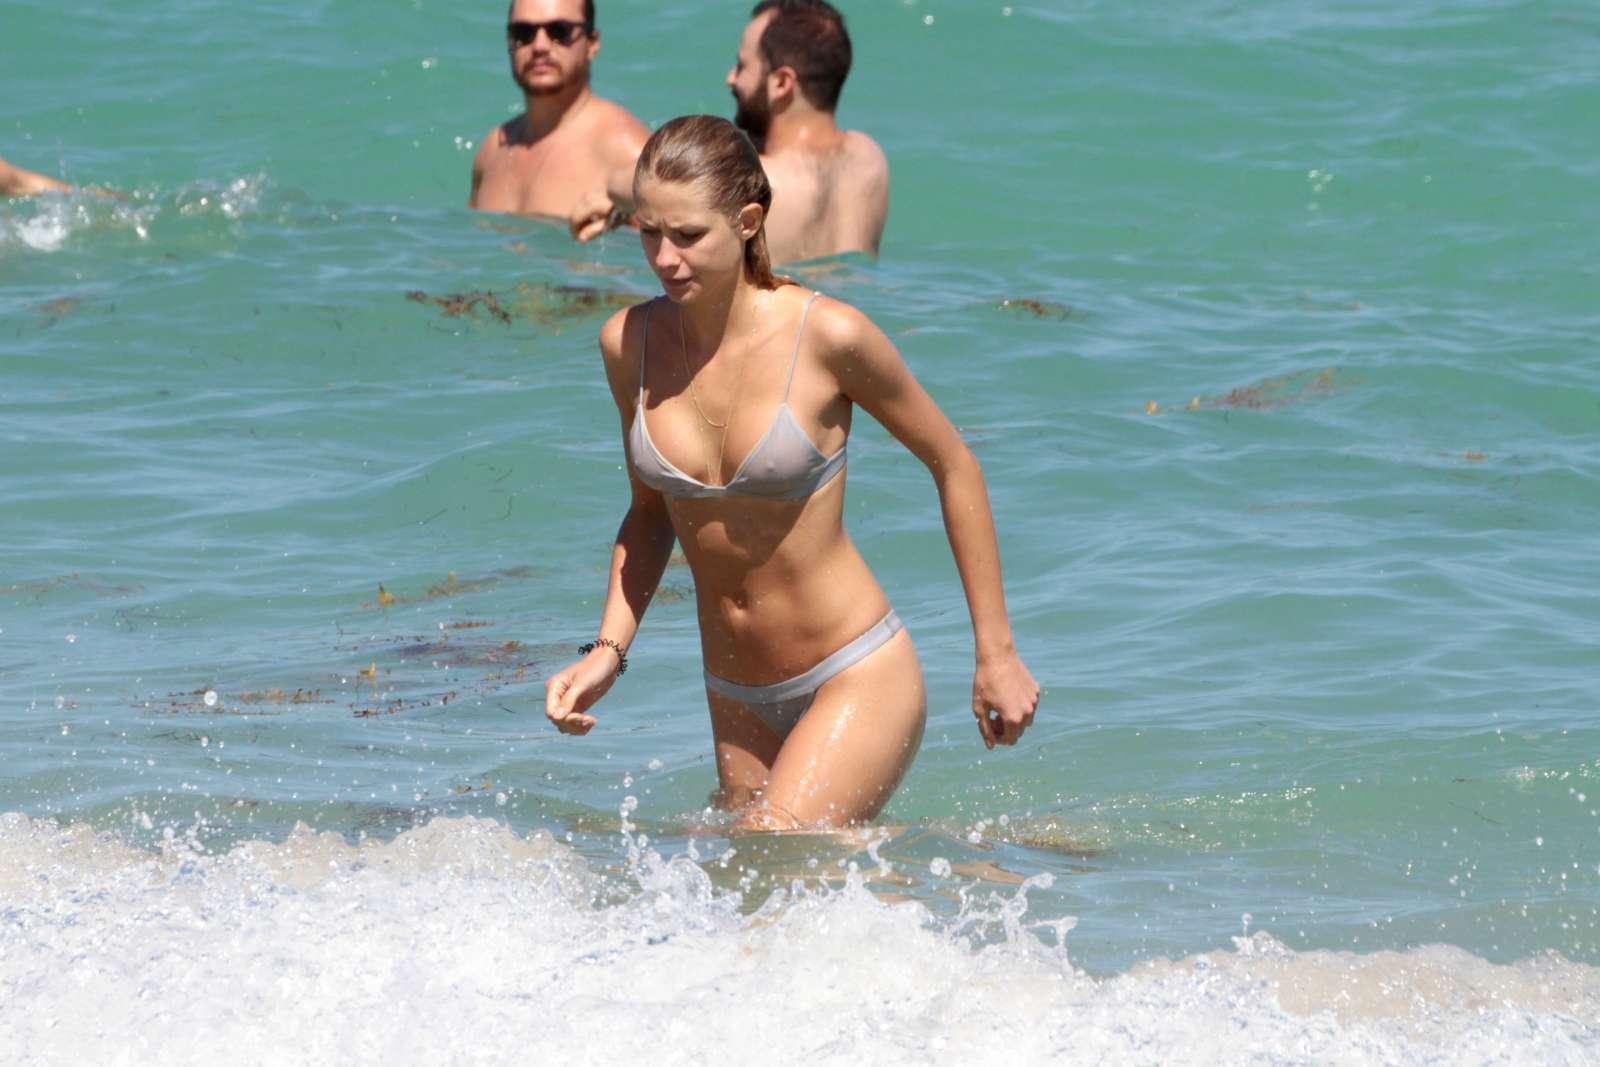 TheFappening Anouk Van Kleef nudes (14 photos), Ass, Leaked, Feet, swimsuit 2015